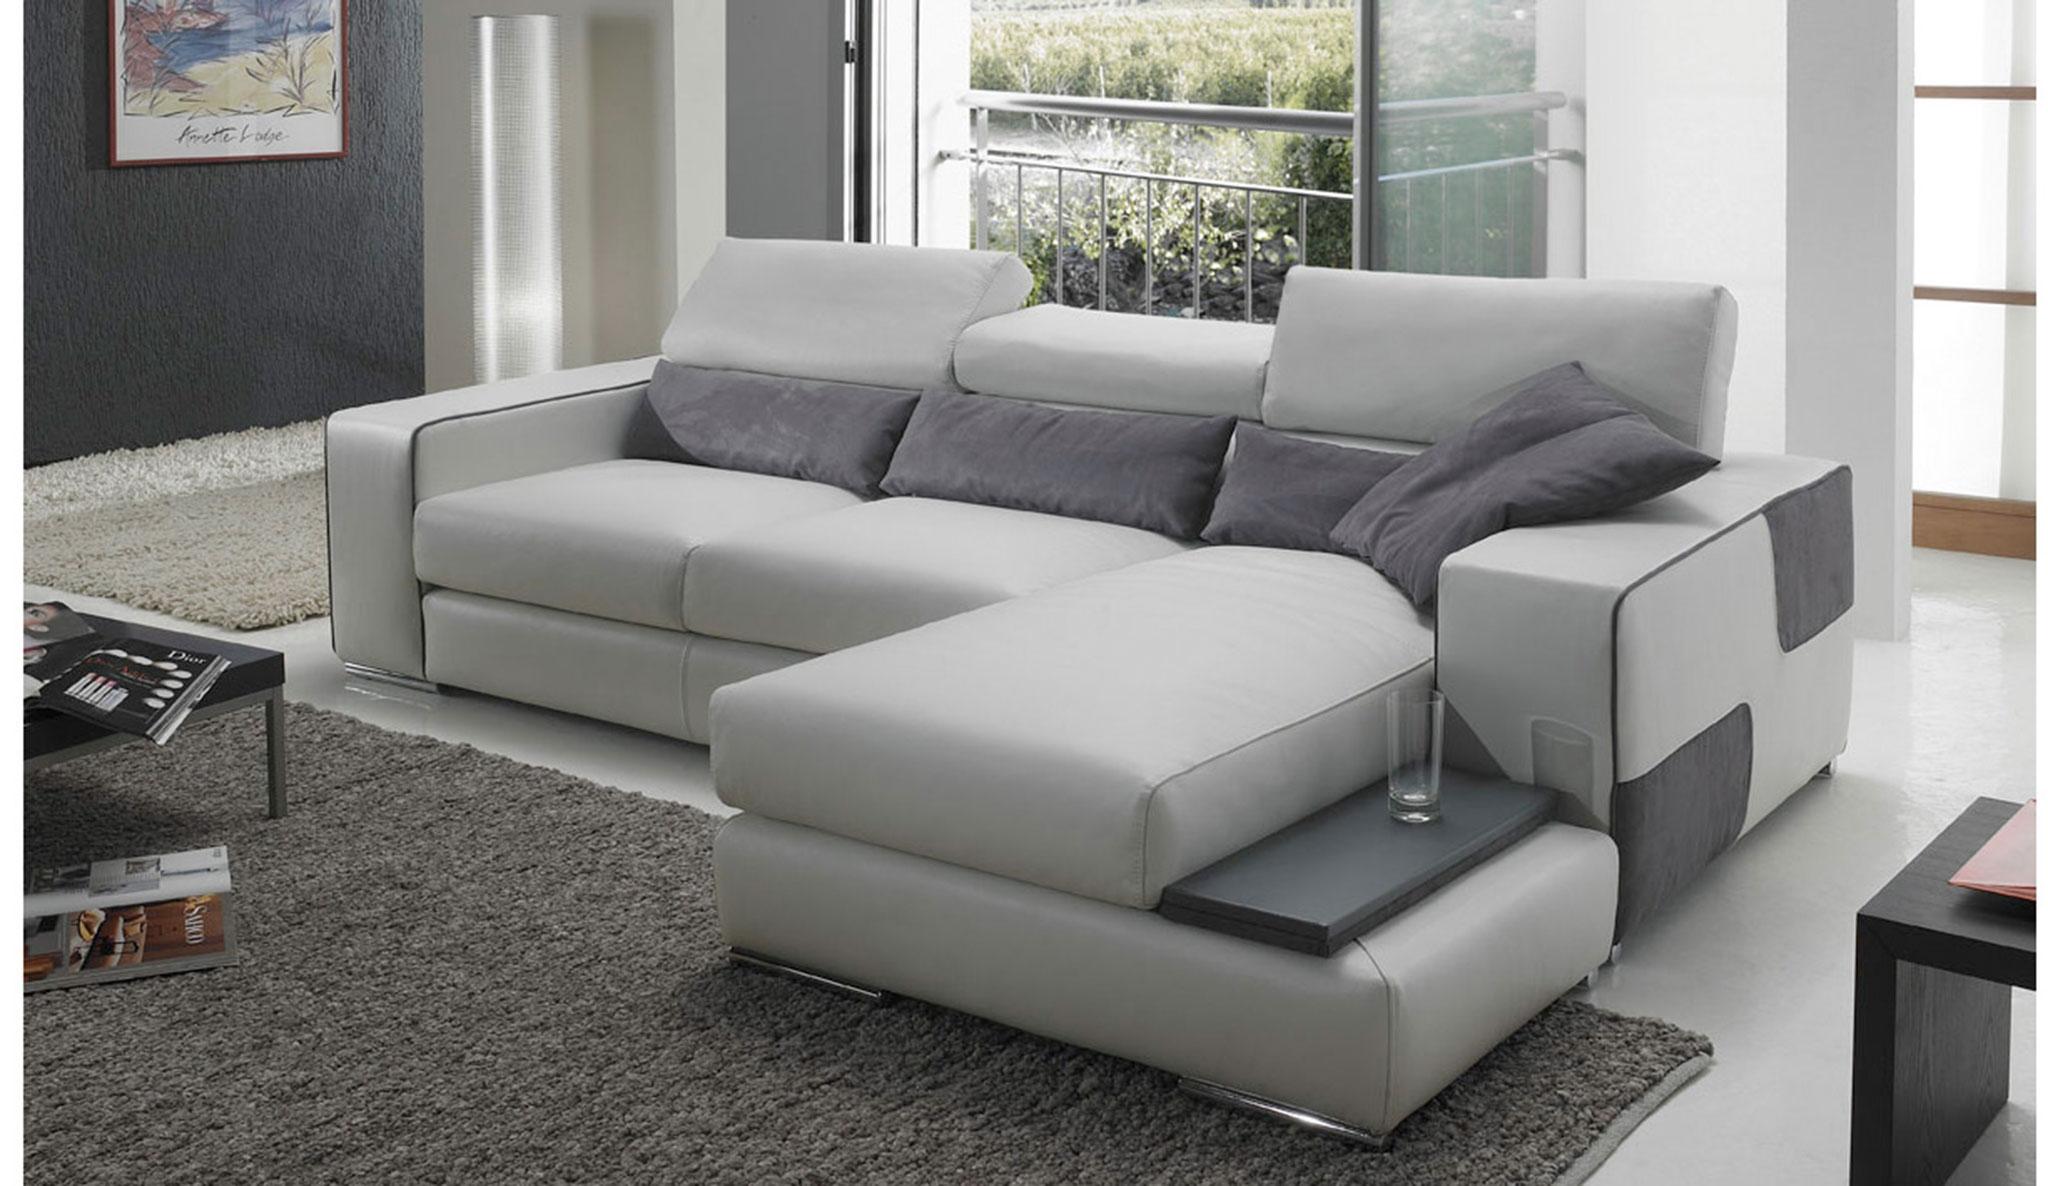 Canape d angle cuir design pas cher Lareduc